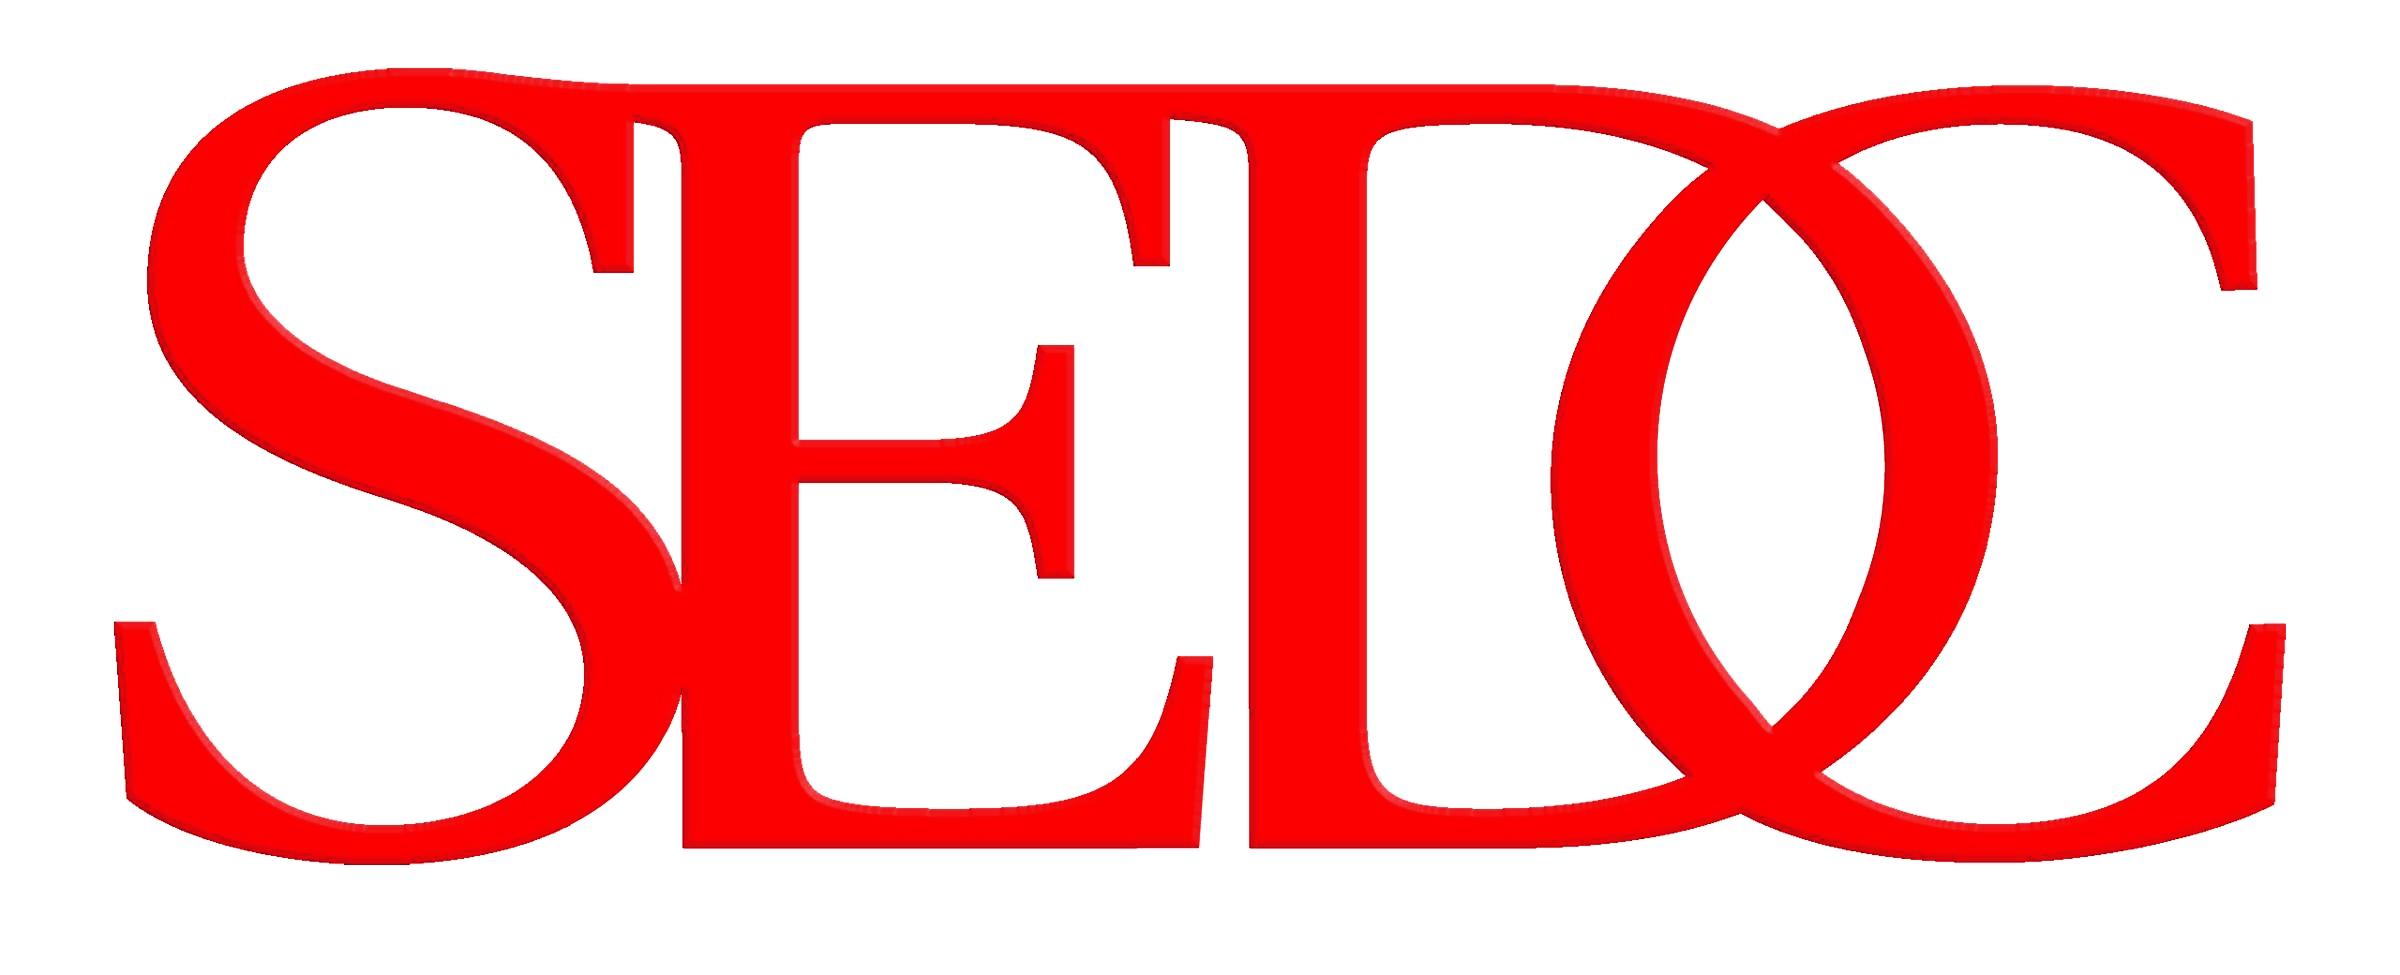 SEDC-logo-286 copy.jpg